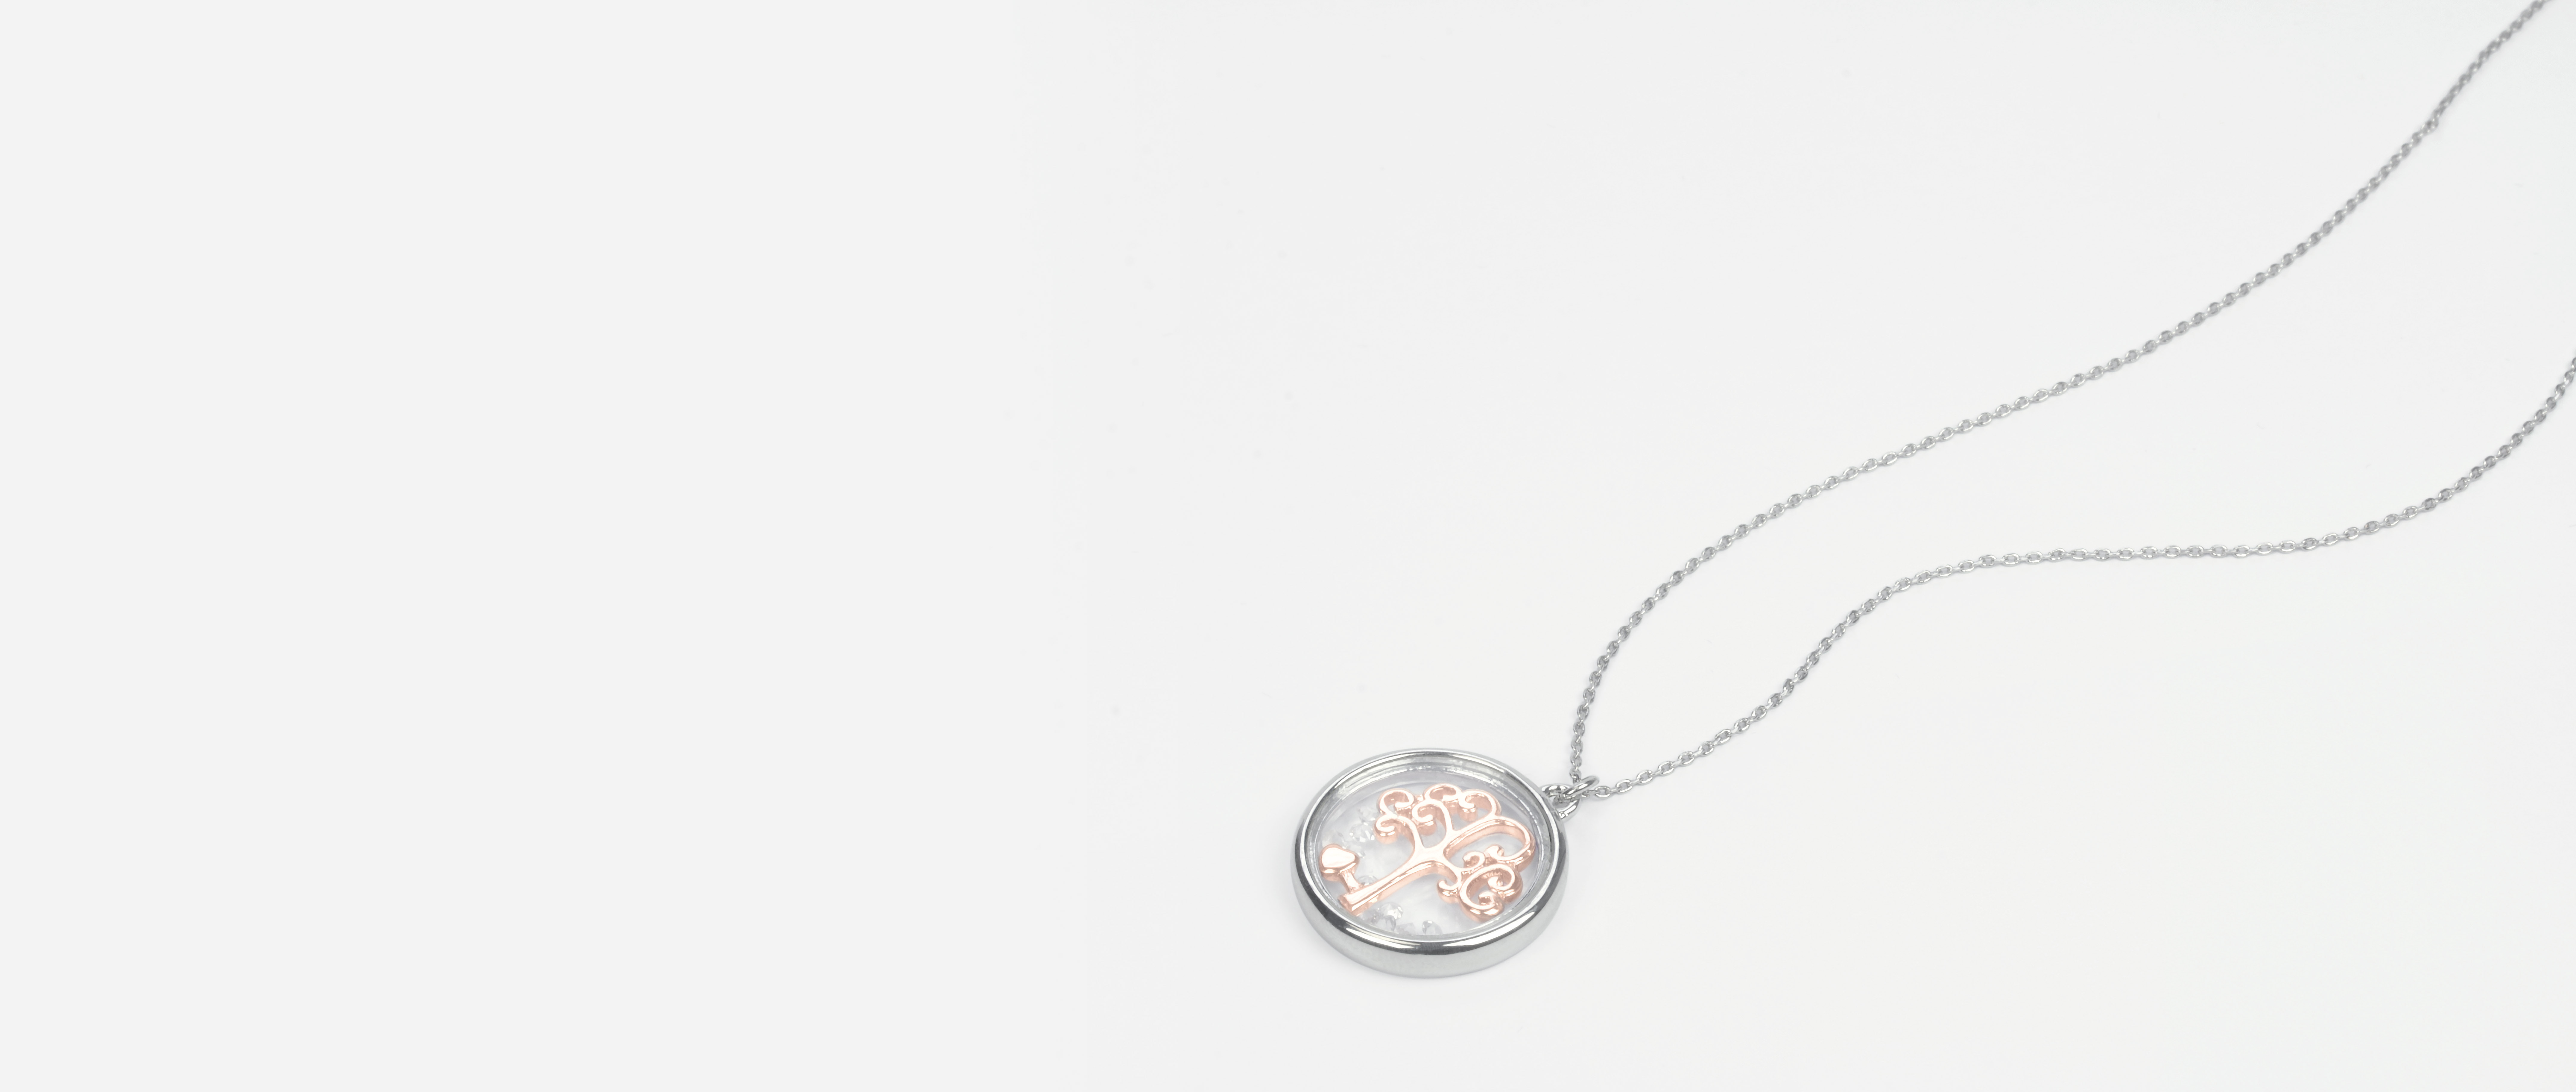 Indulgence Jewellery - Necklace